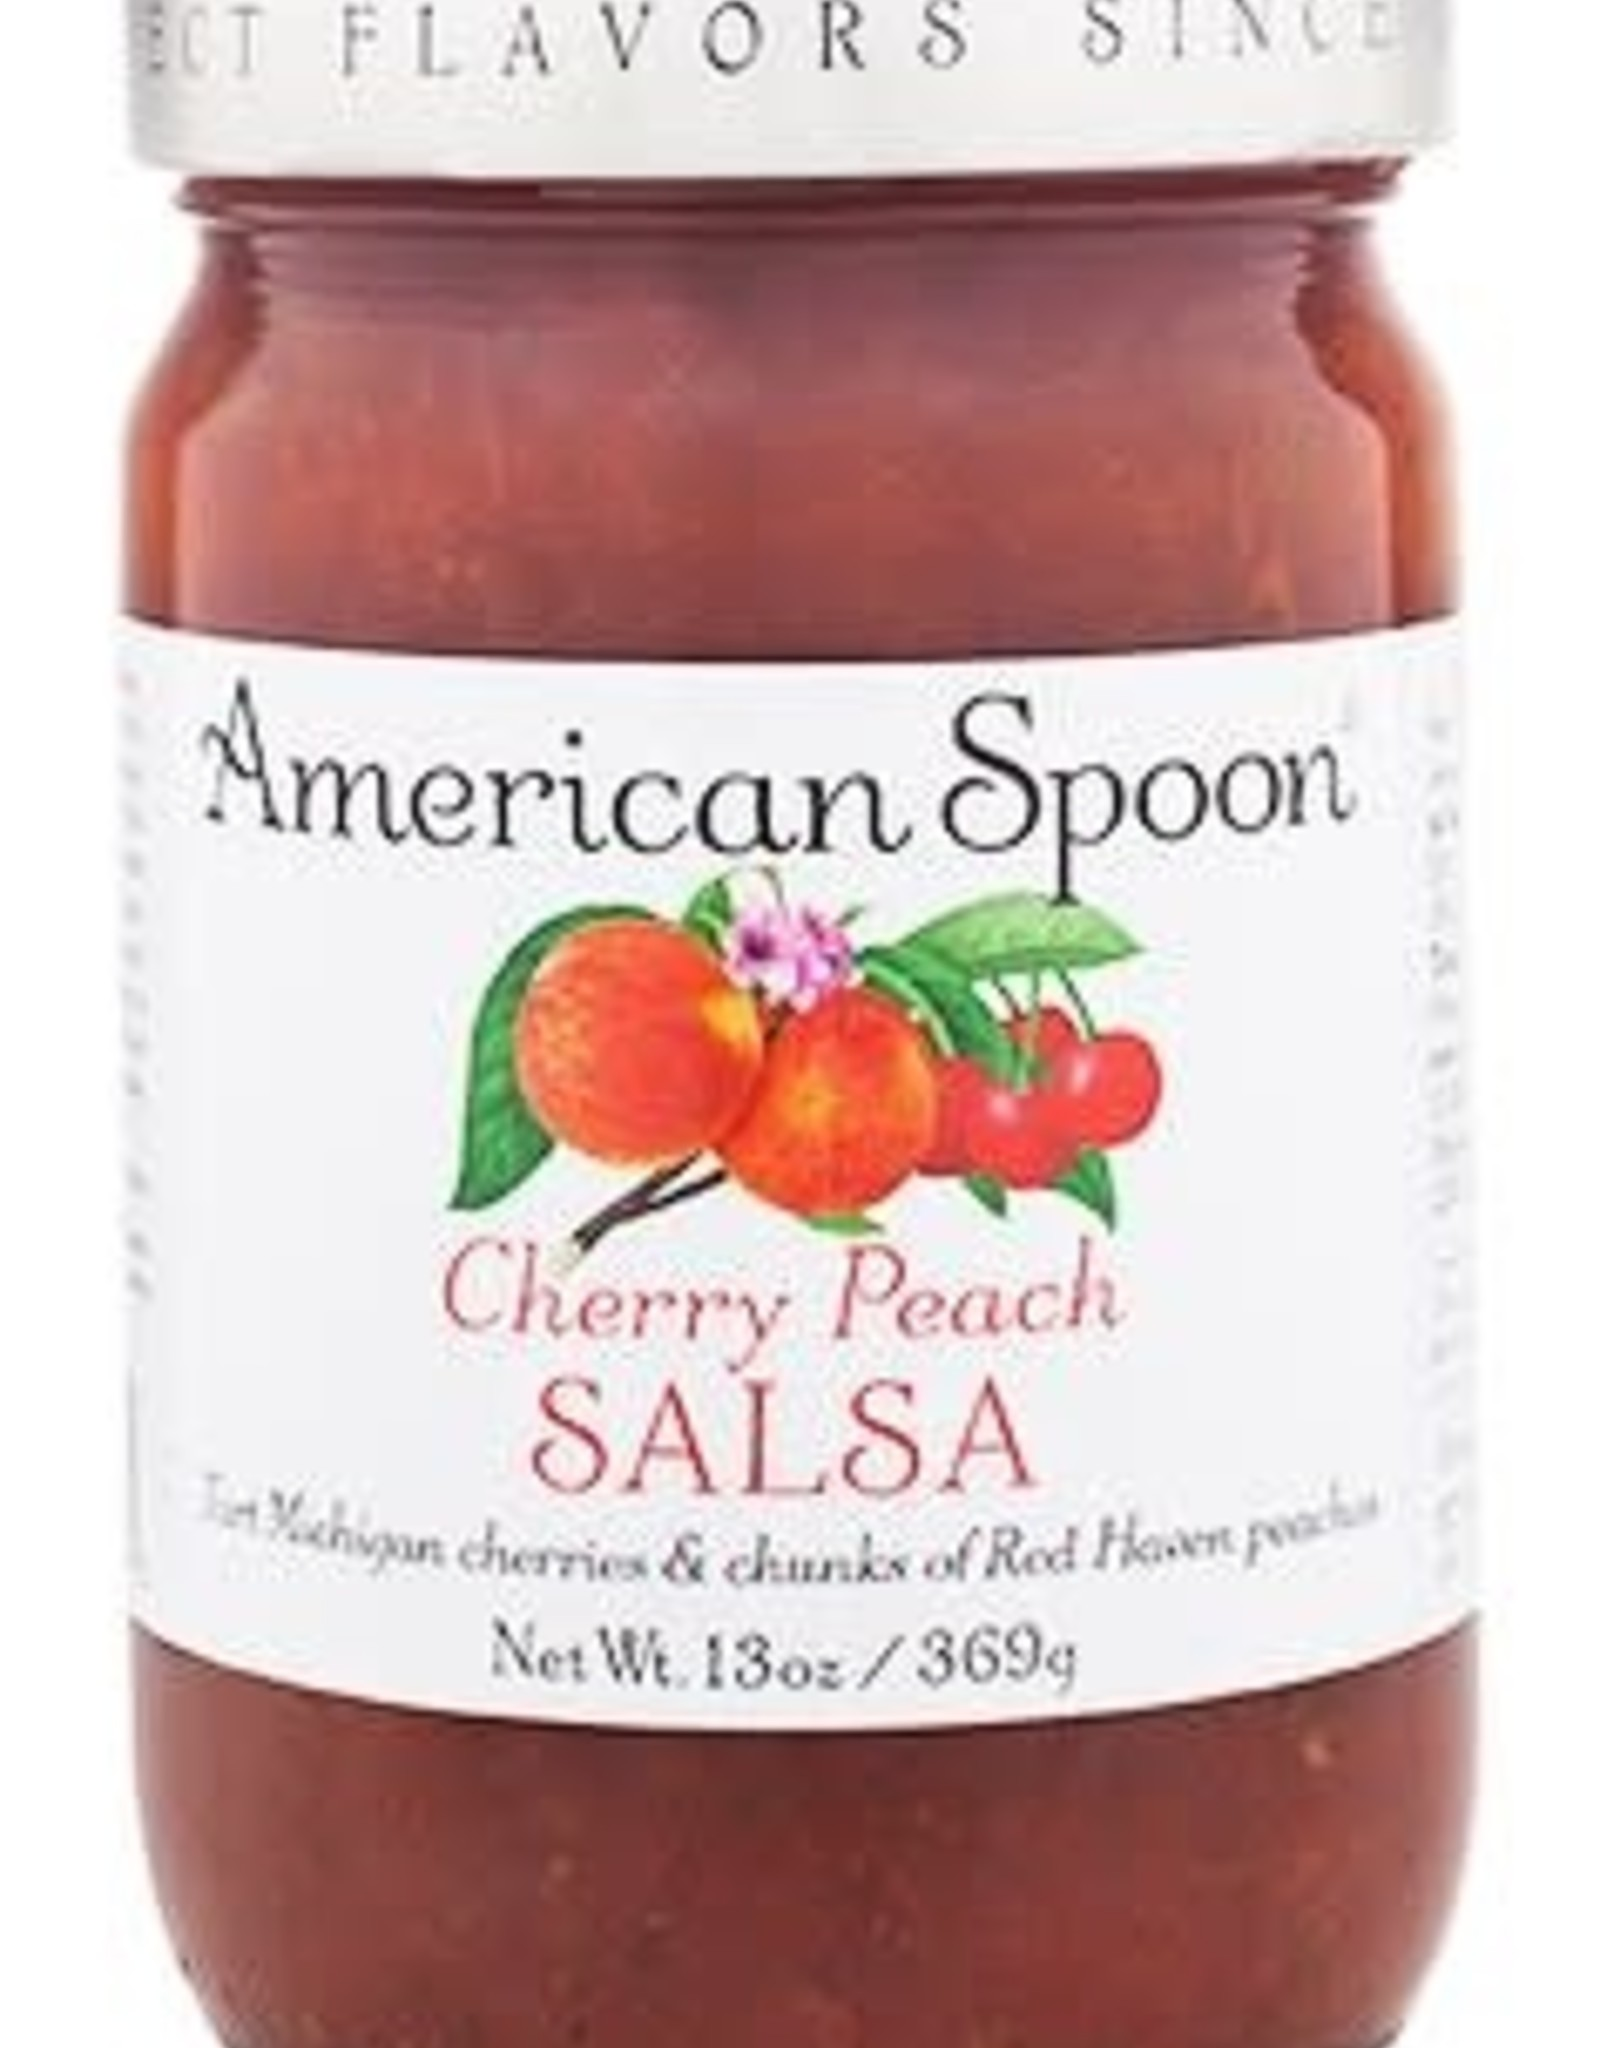 American Spoon AMERICAN SPOON CHERRY PEACH SALSA